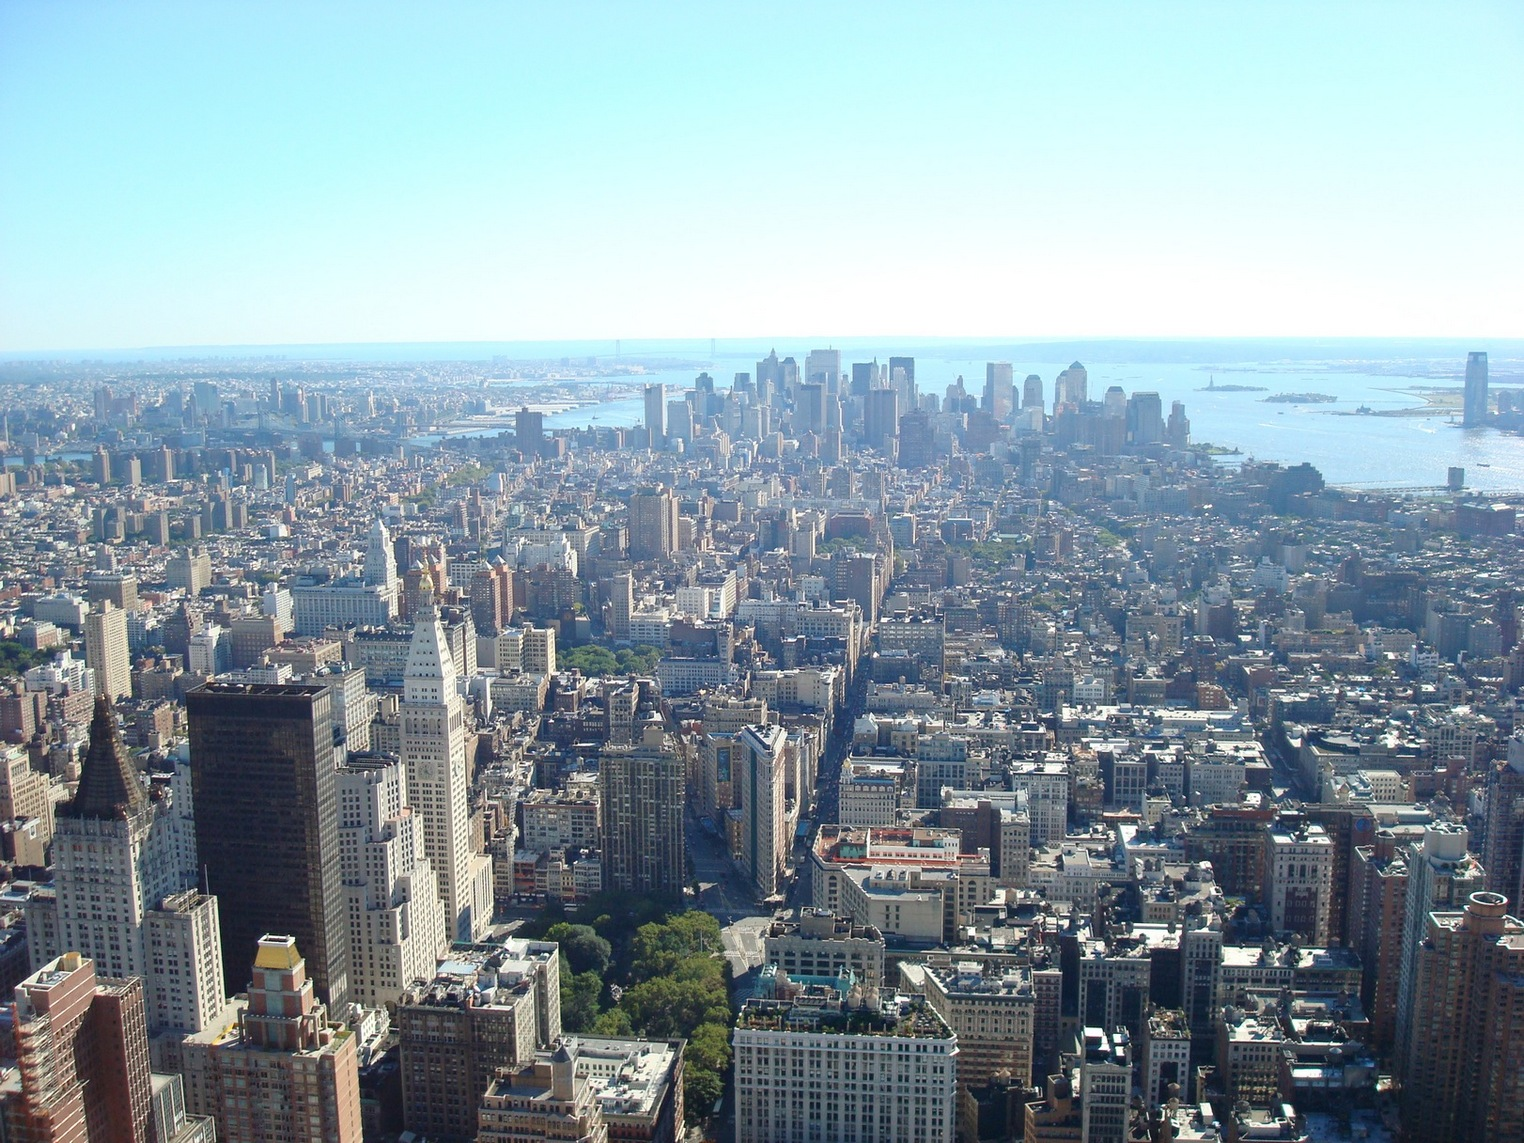 New York City_EmpireStateBuildingObservatory_ViewofLowerManhattan_FlatironBuilding